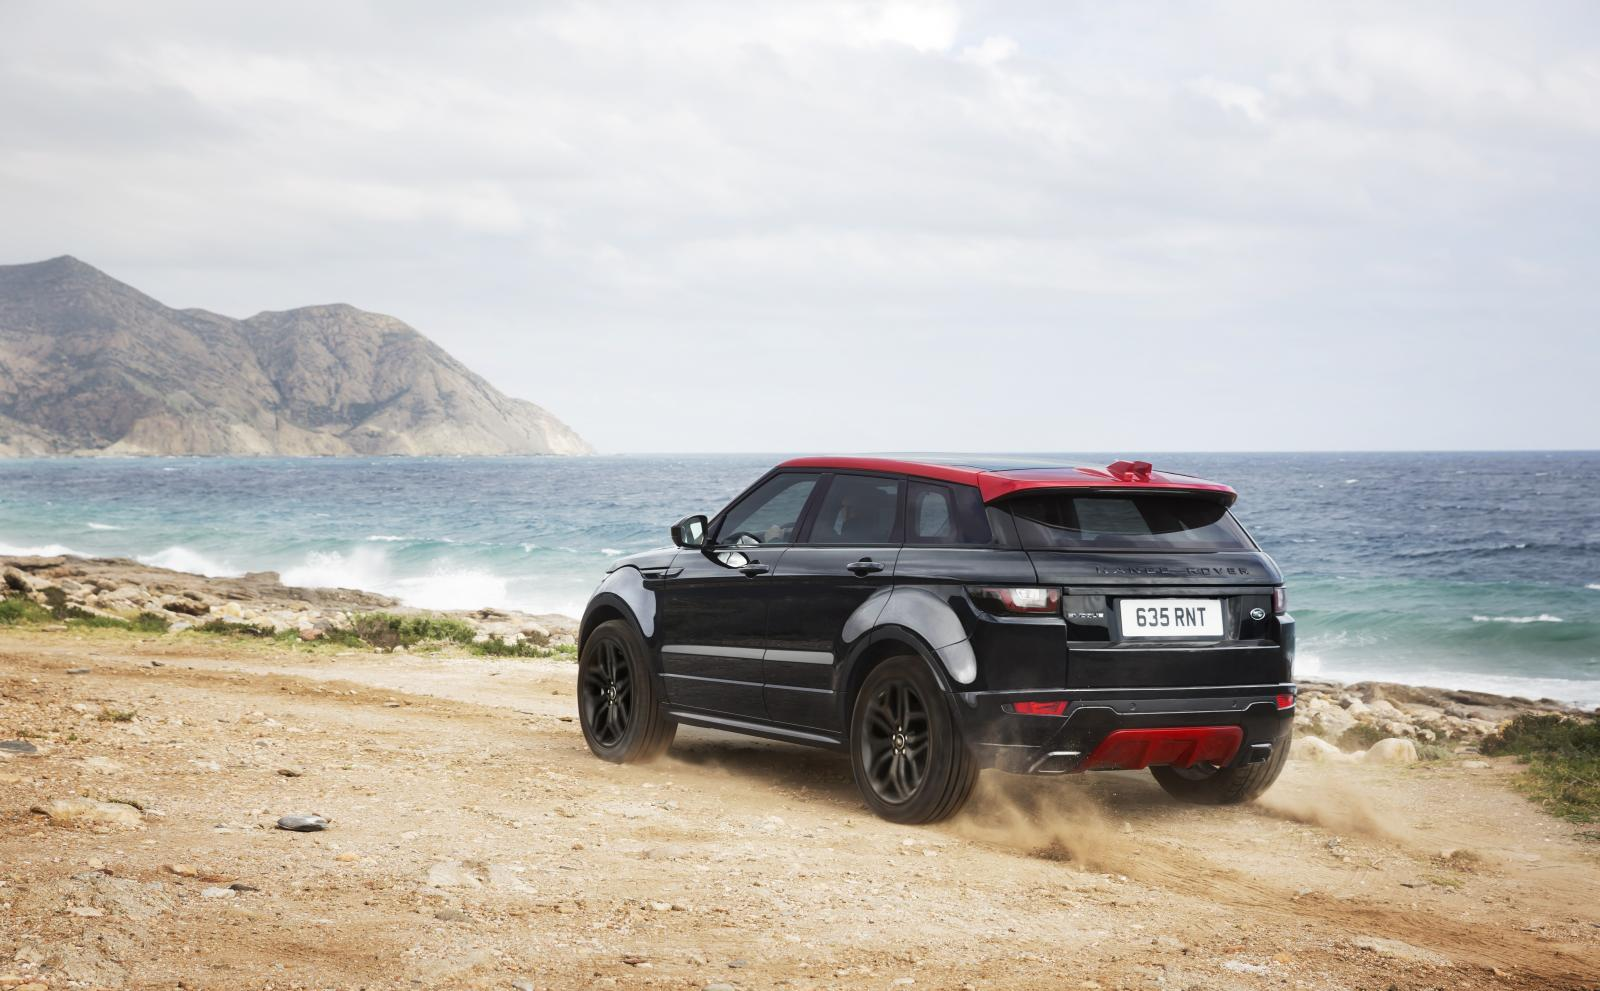 Range Rover Evoque Ember Edition: Negro sobre rojo 4